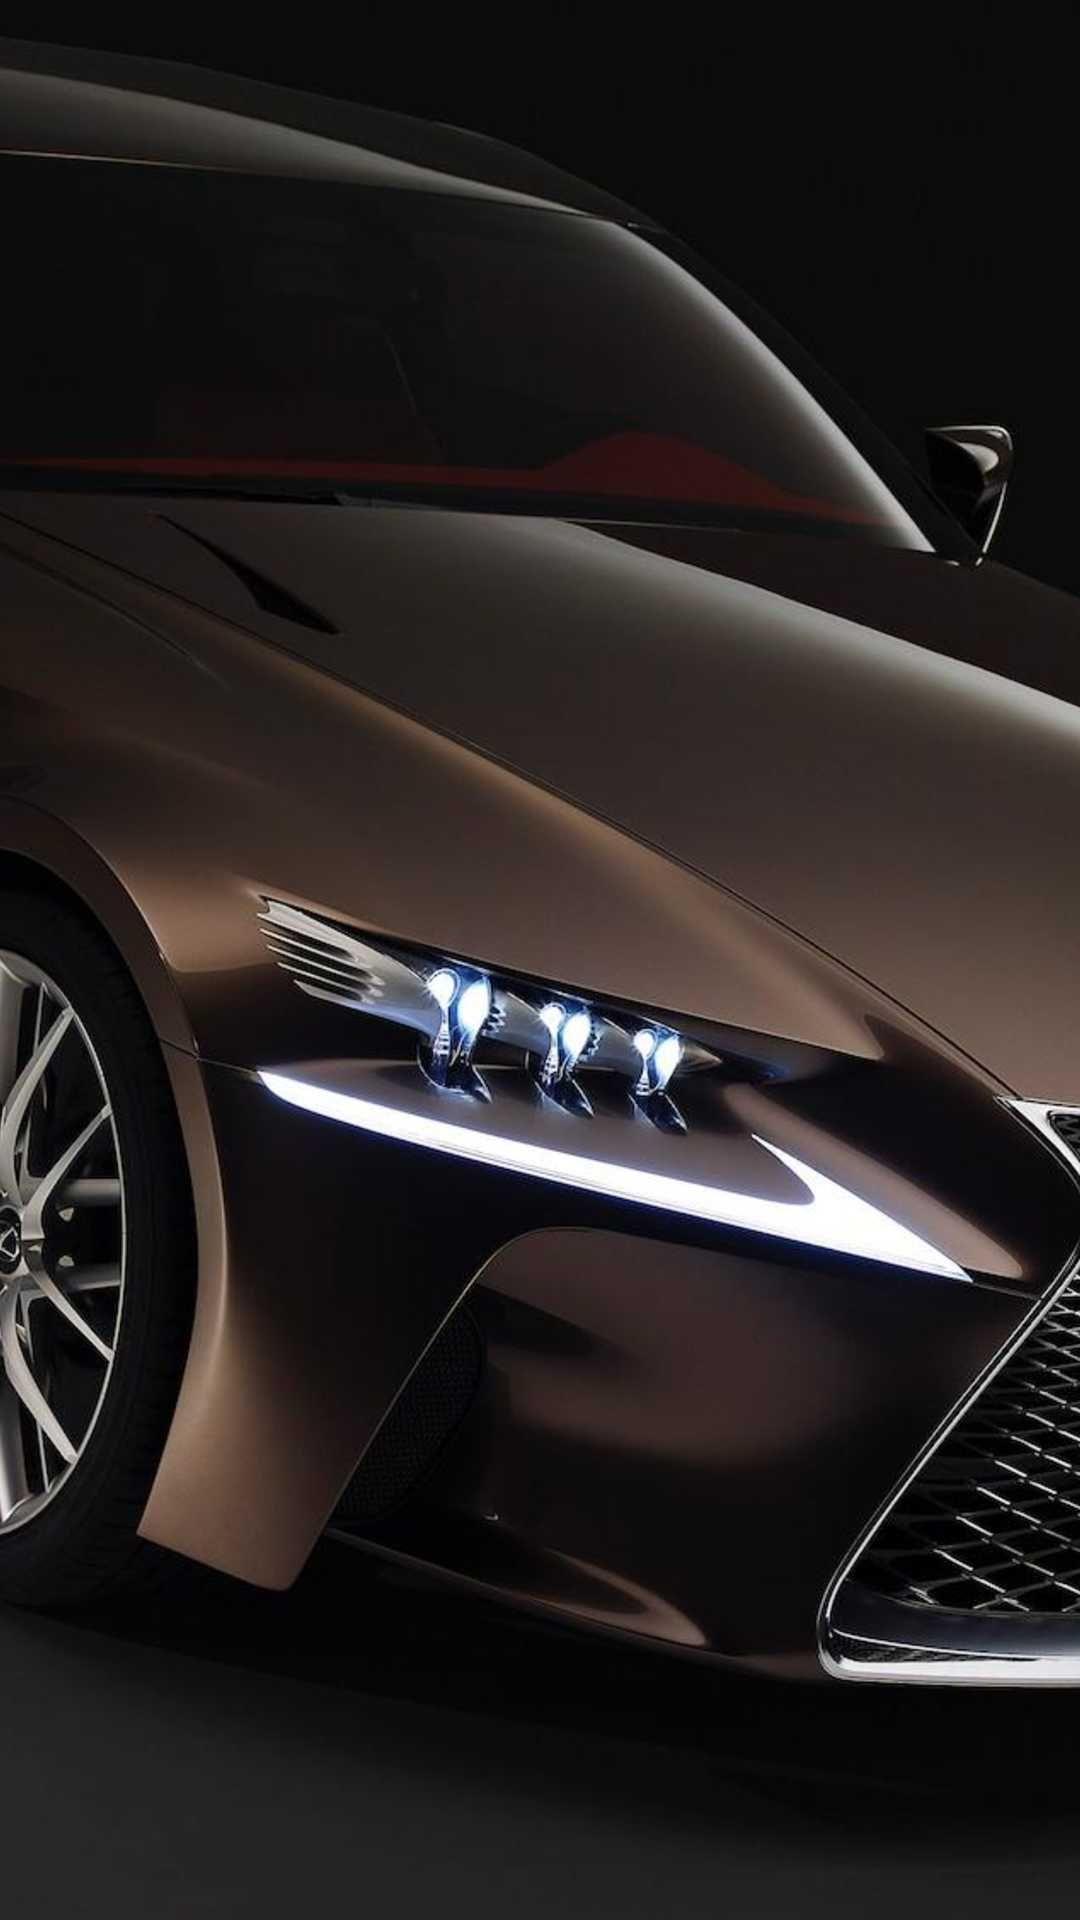 Wallpaper Download 1080x1920 Brown Lexus RX on the black 1080x1920